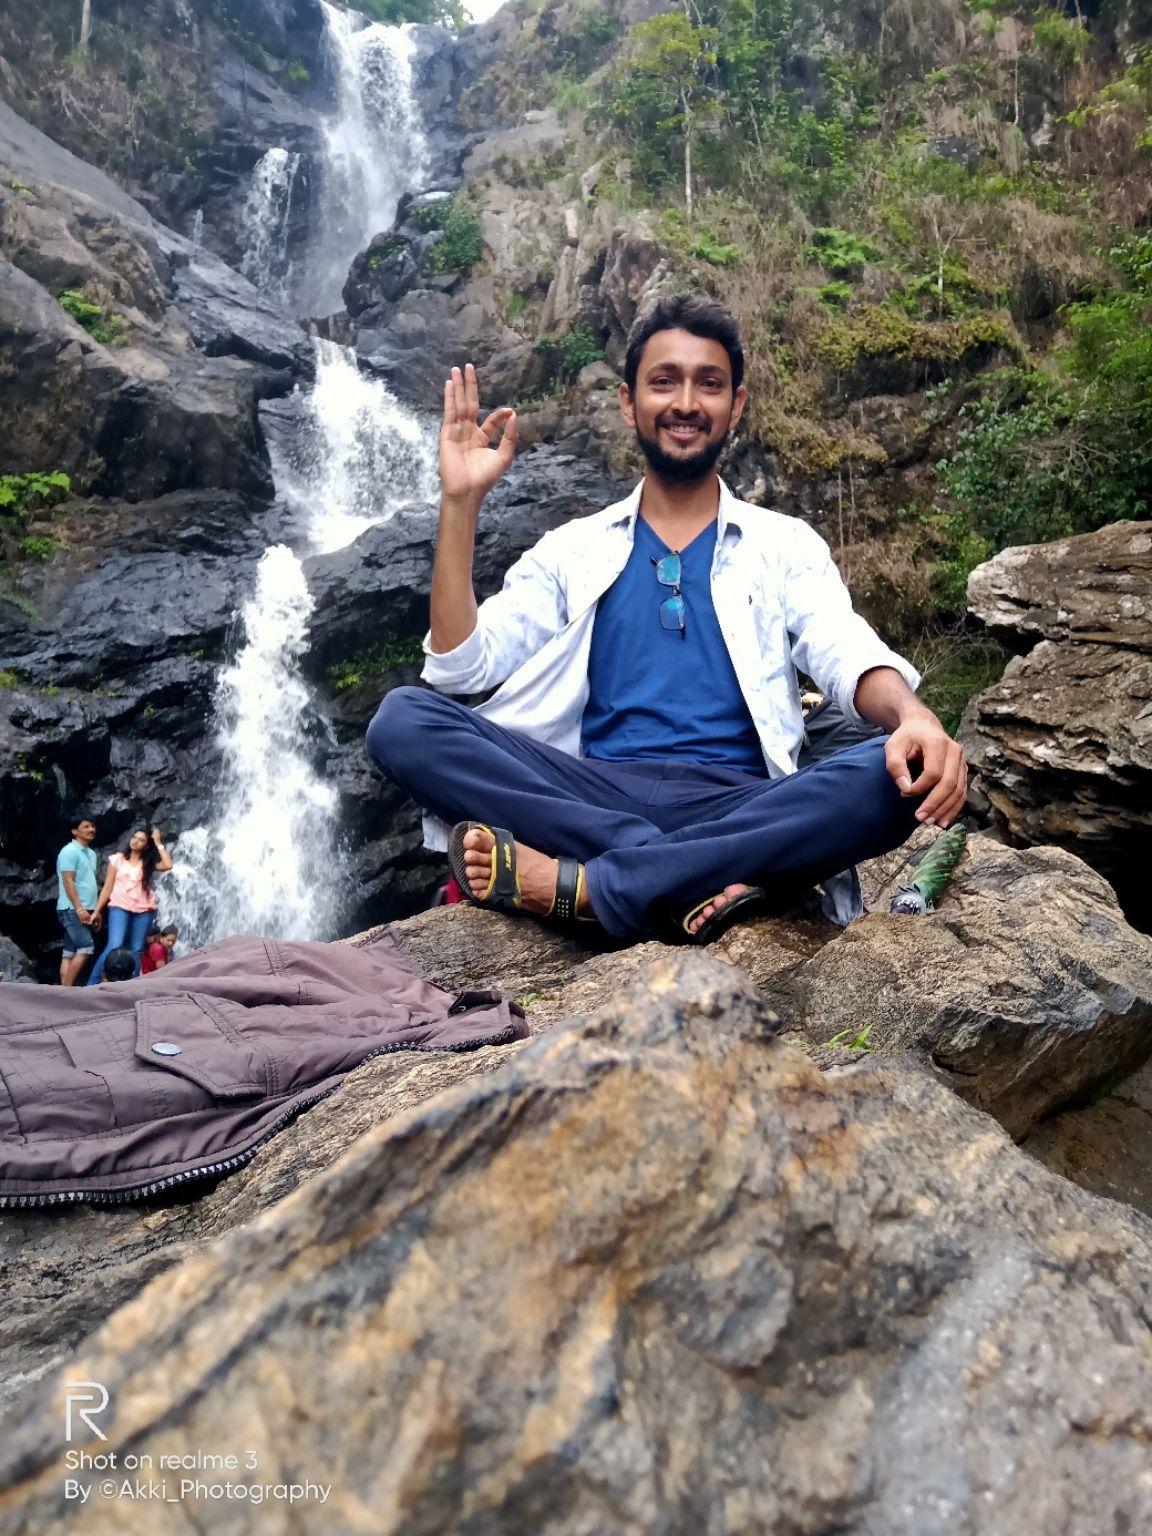 Photo of Iruppu Waterfalls By Akshay Sikarwar